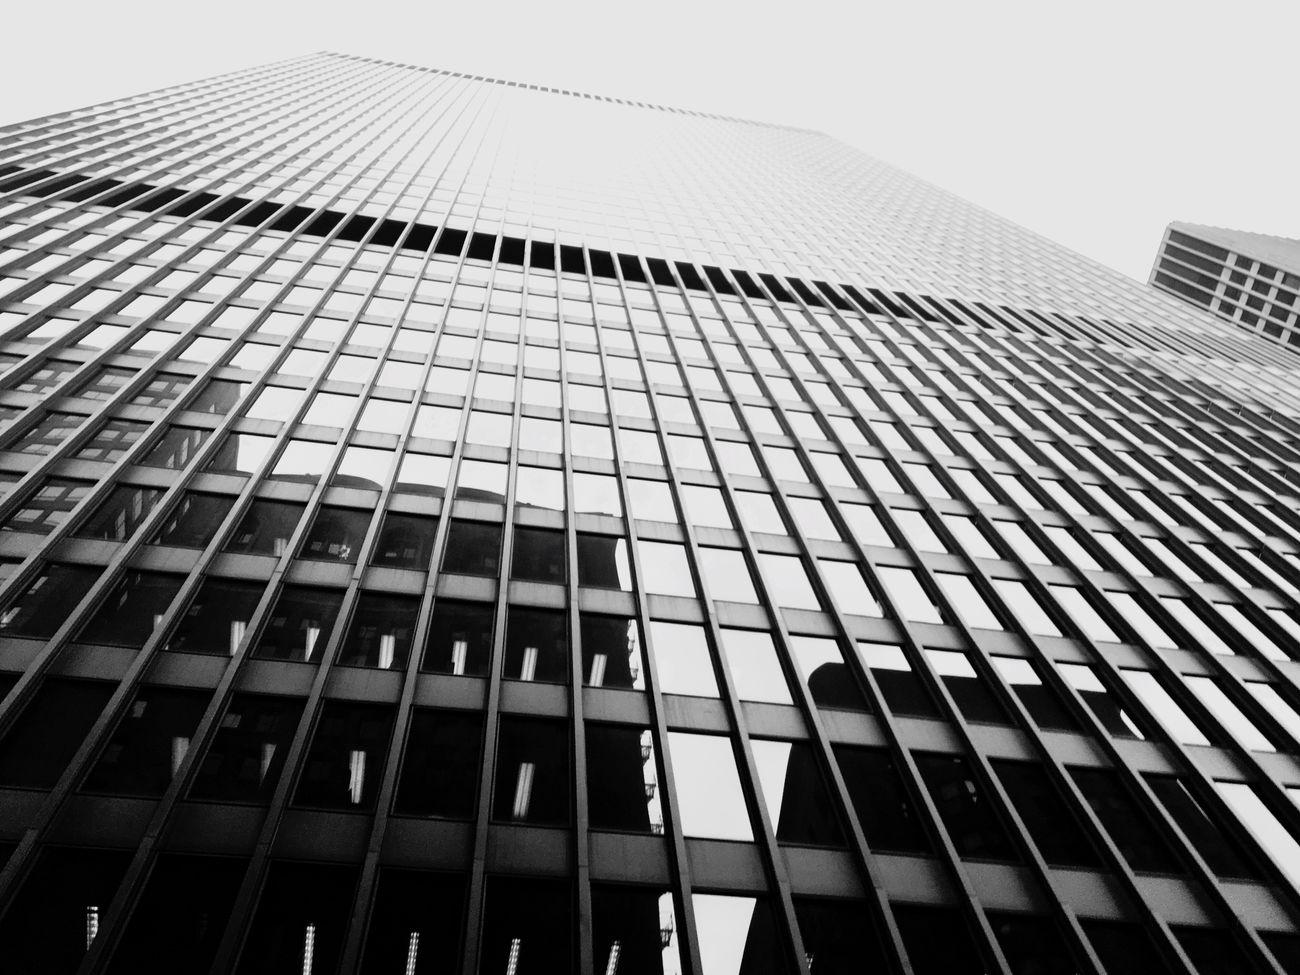 Architecture Skyscraper City Mies Van Der Rohe